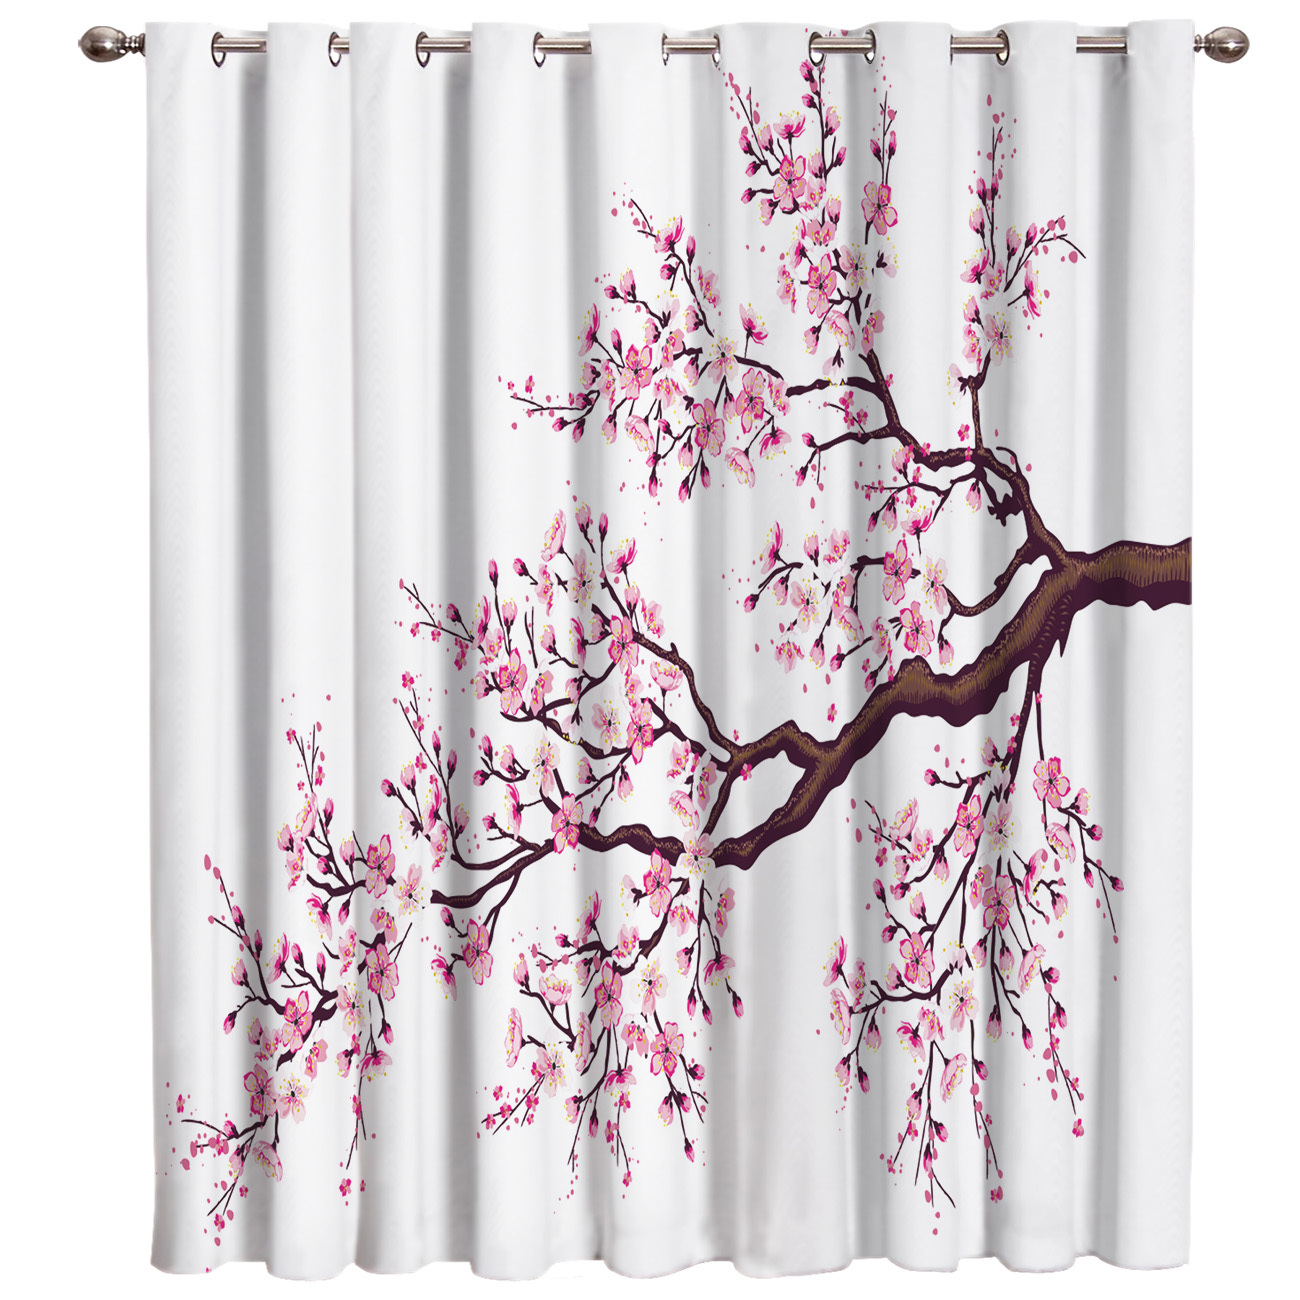 Pink Cherry Blossoms Flower Window